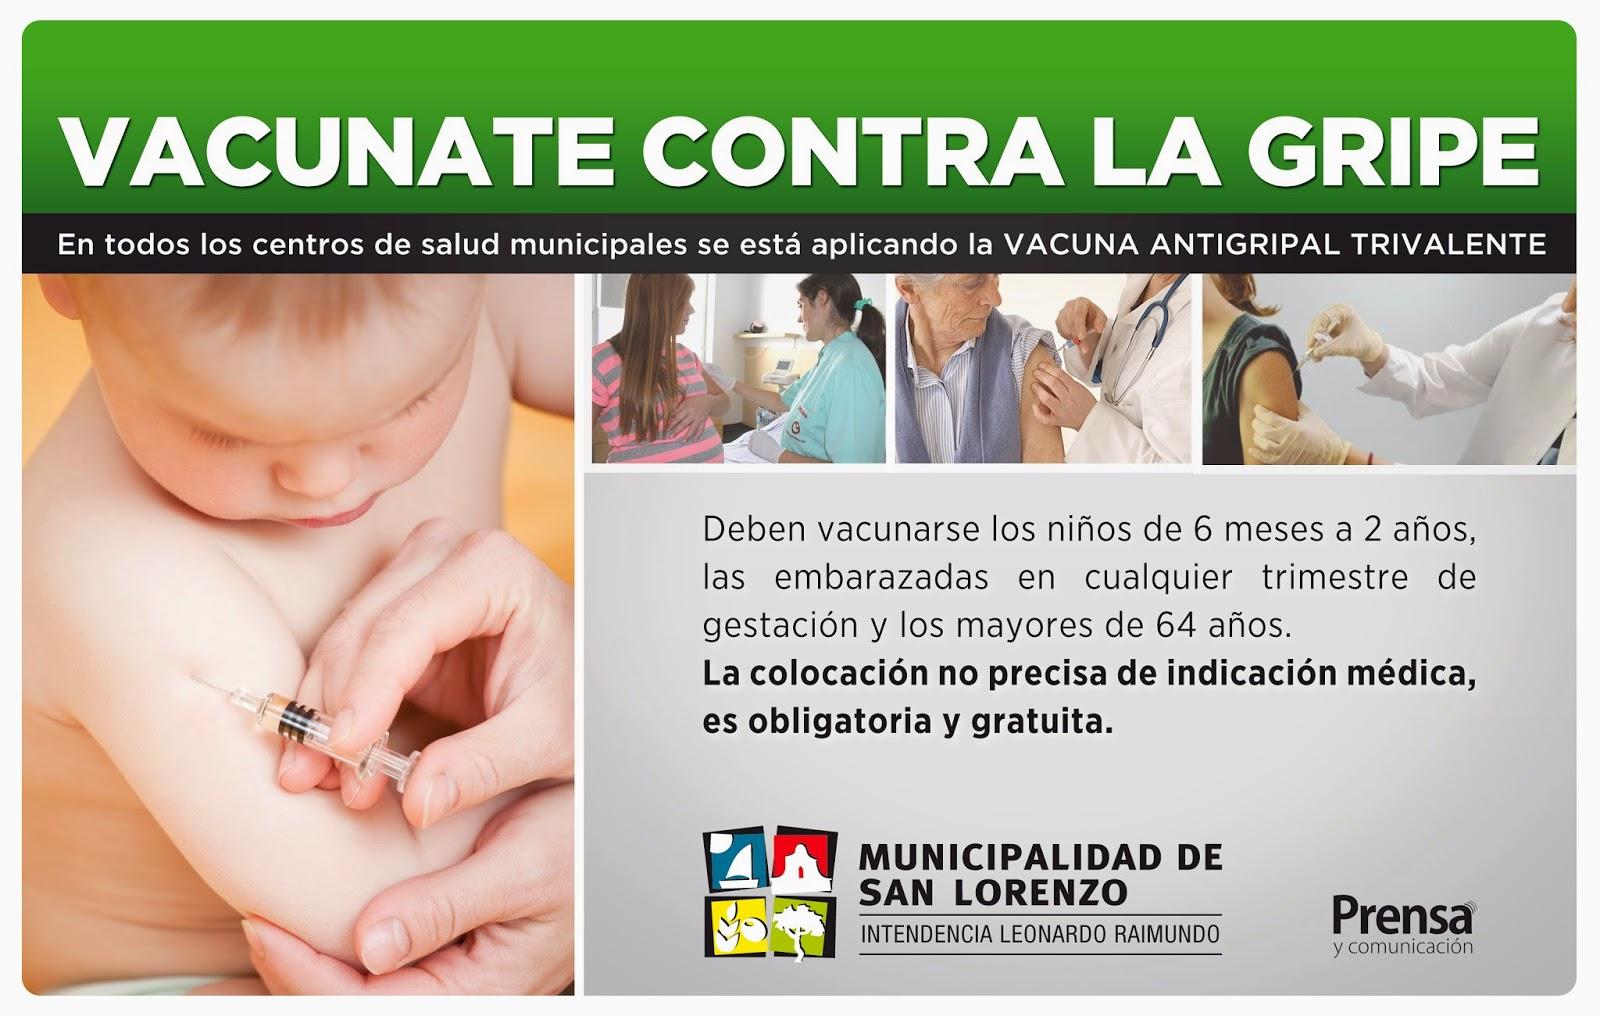 Vacuna antigripal - Aviso gráfico vigente